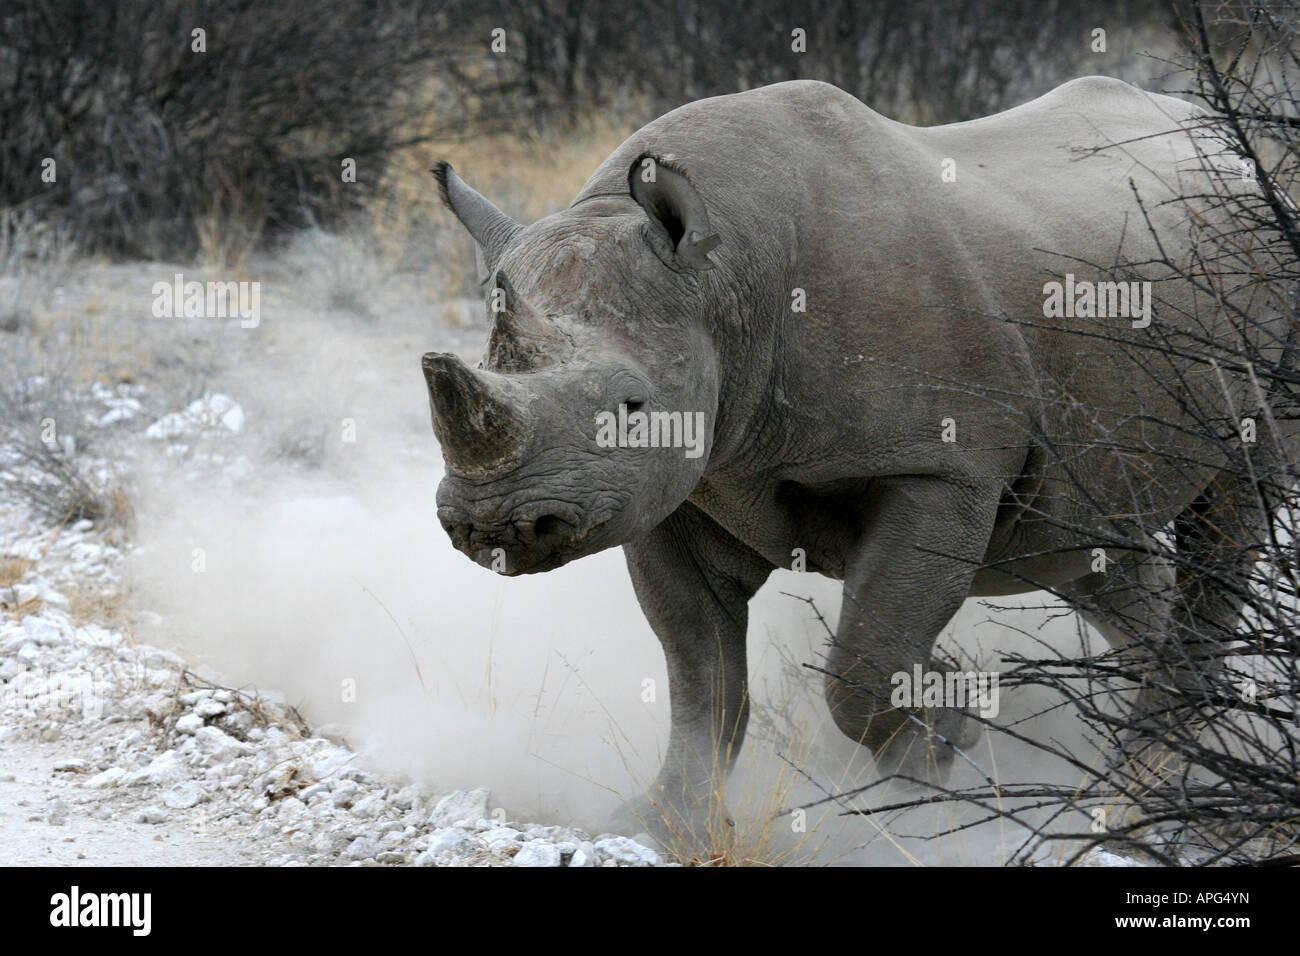 Black Rhino Charging - Stock Image